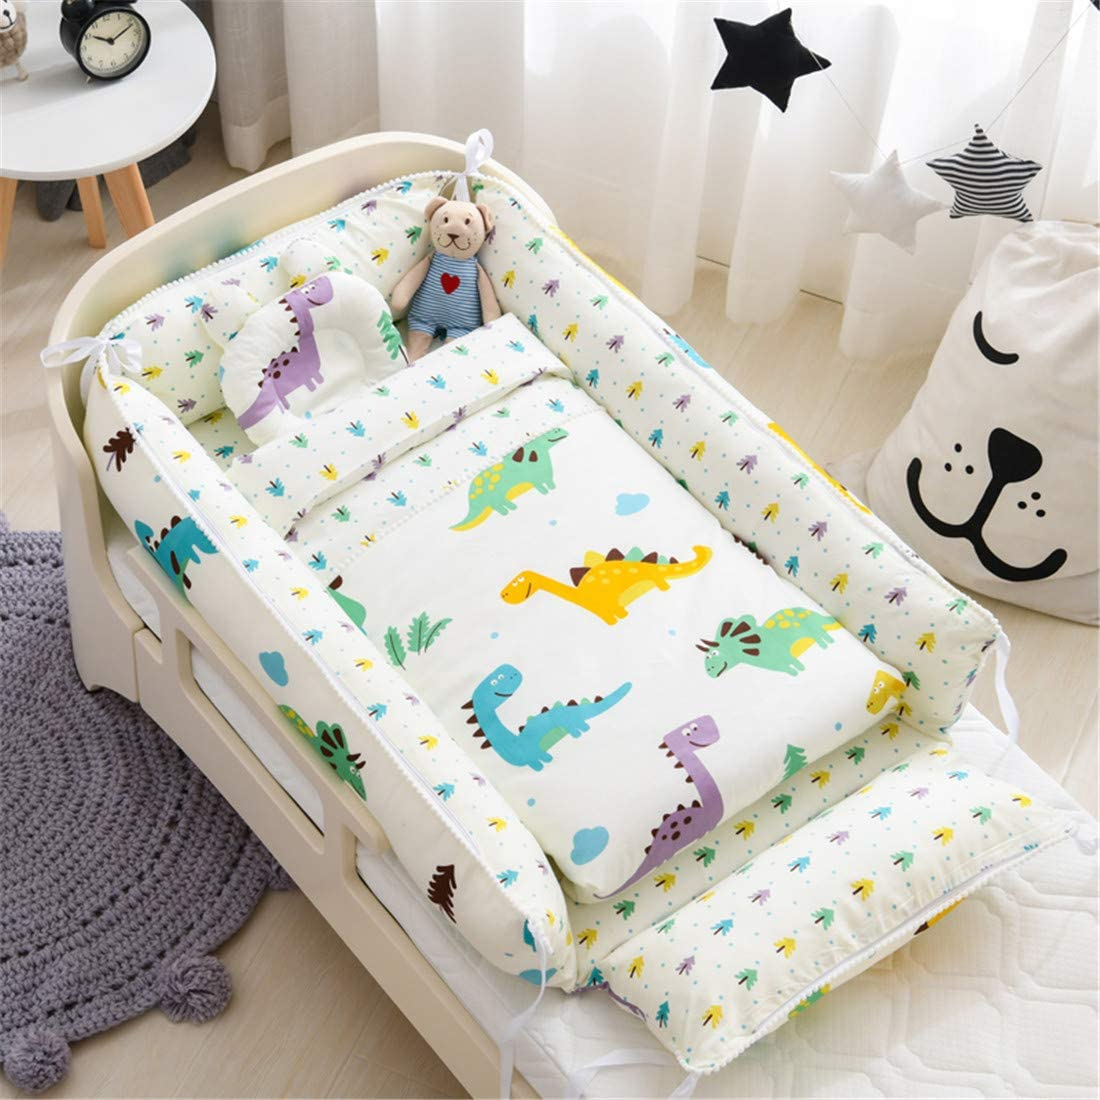 Ustide Baby Bassinet Breathable Skin-Friendly 100/% Cotton Portable Hypoallergenic Newborn Sleeping Bed White Bear Print Girls Boys Soft Warm Cradle Baby Gift